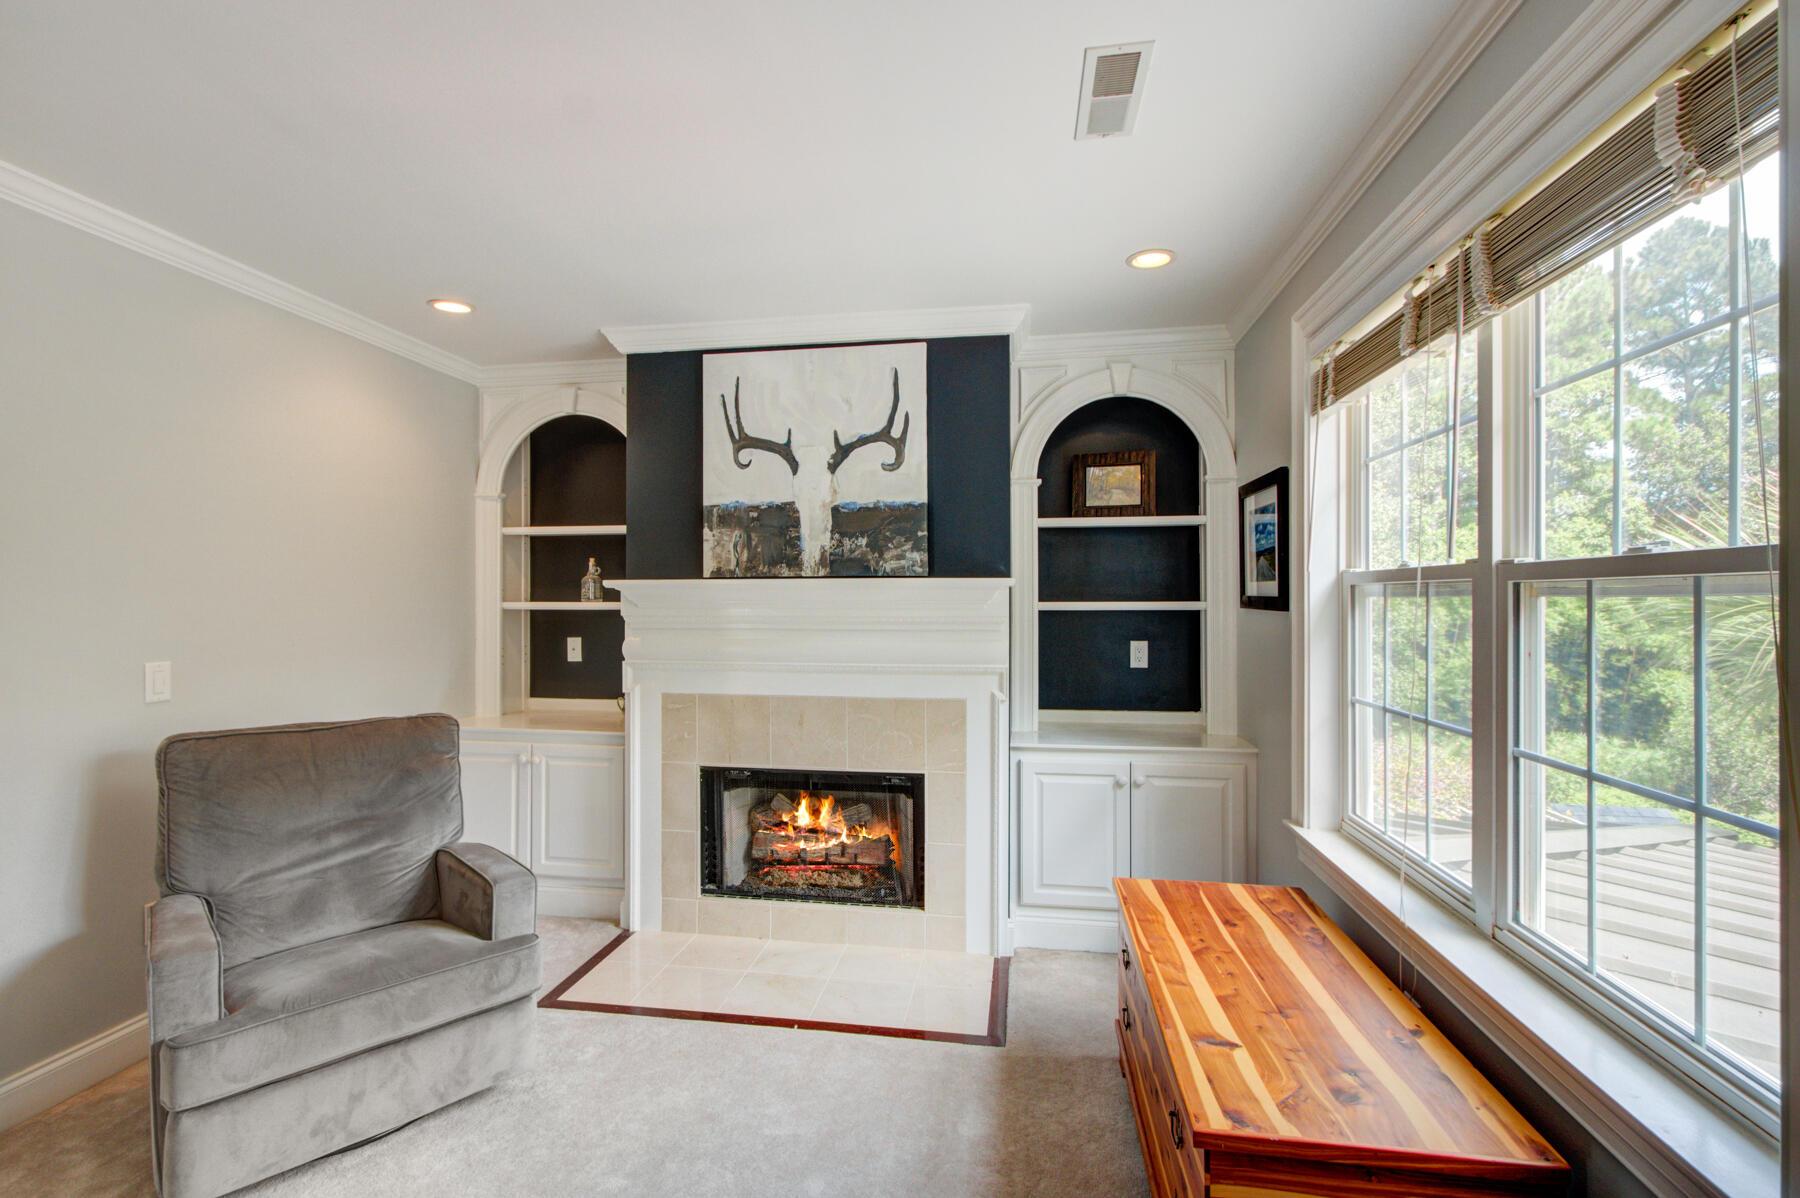 Dunes West Homes For Sale - 3095 Pignatelli, Mount Pleasant, SC - 26